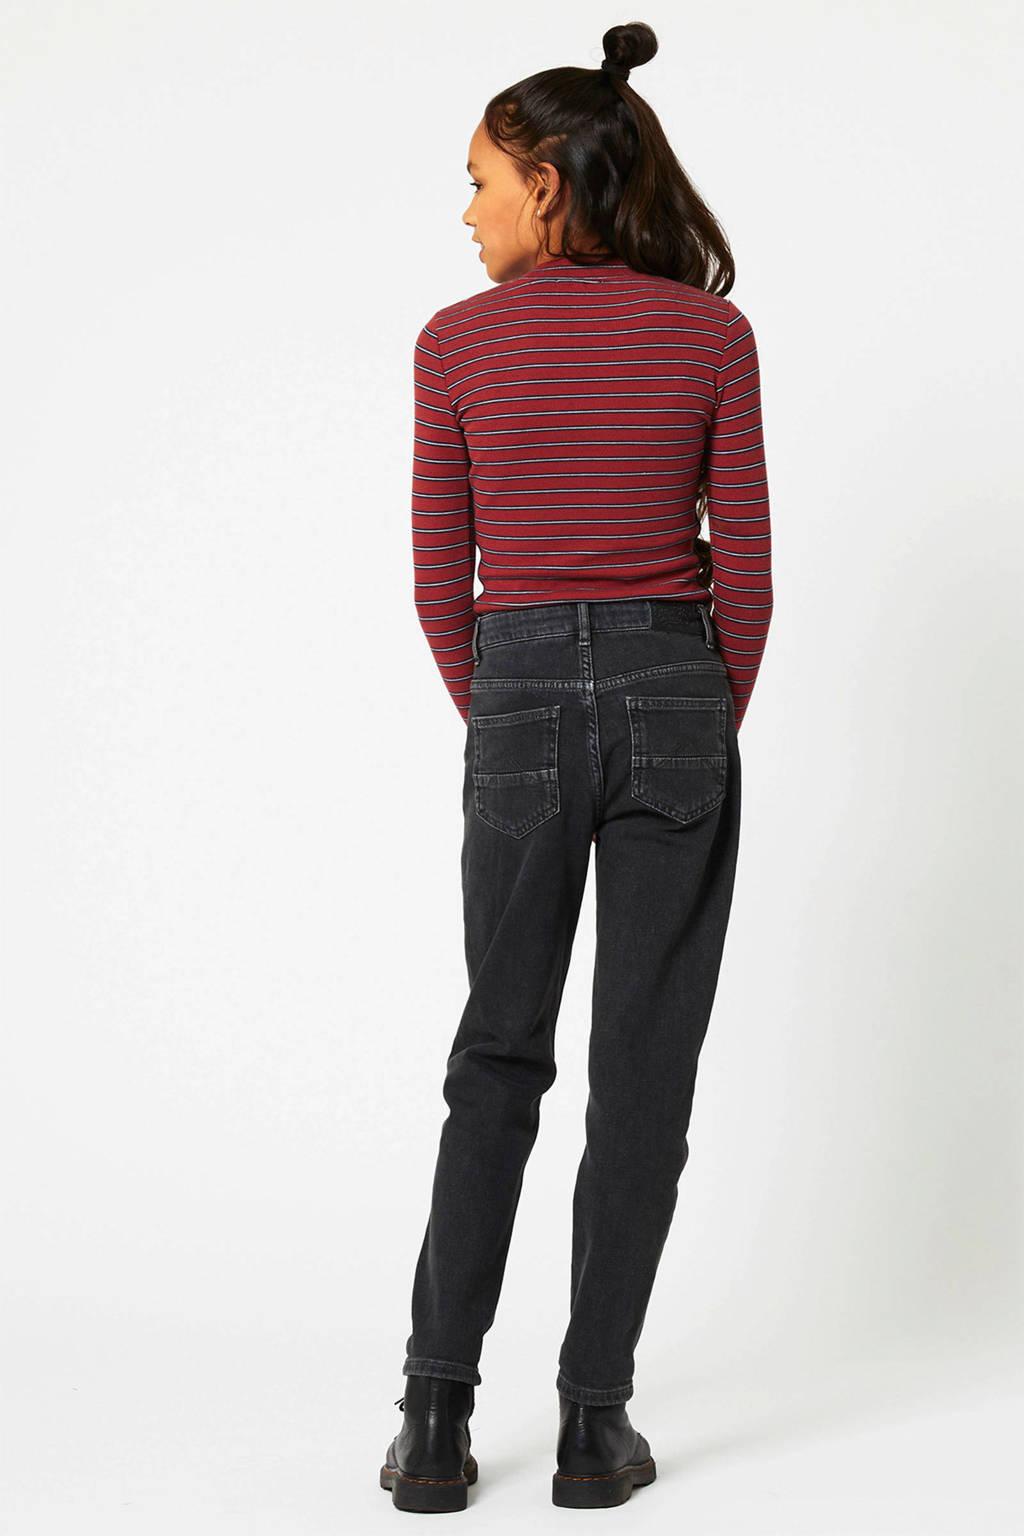 America Today Junior high waist tapered fit jeans Jadan zwart, Zwart